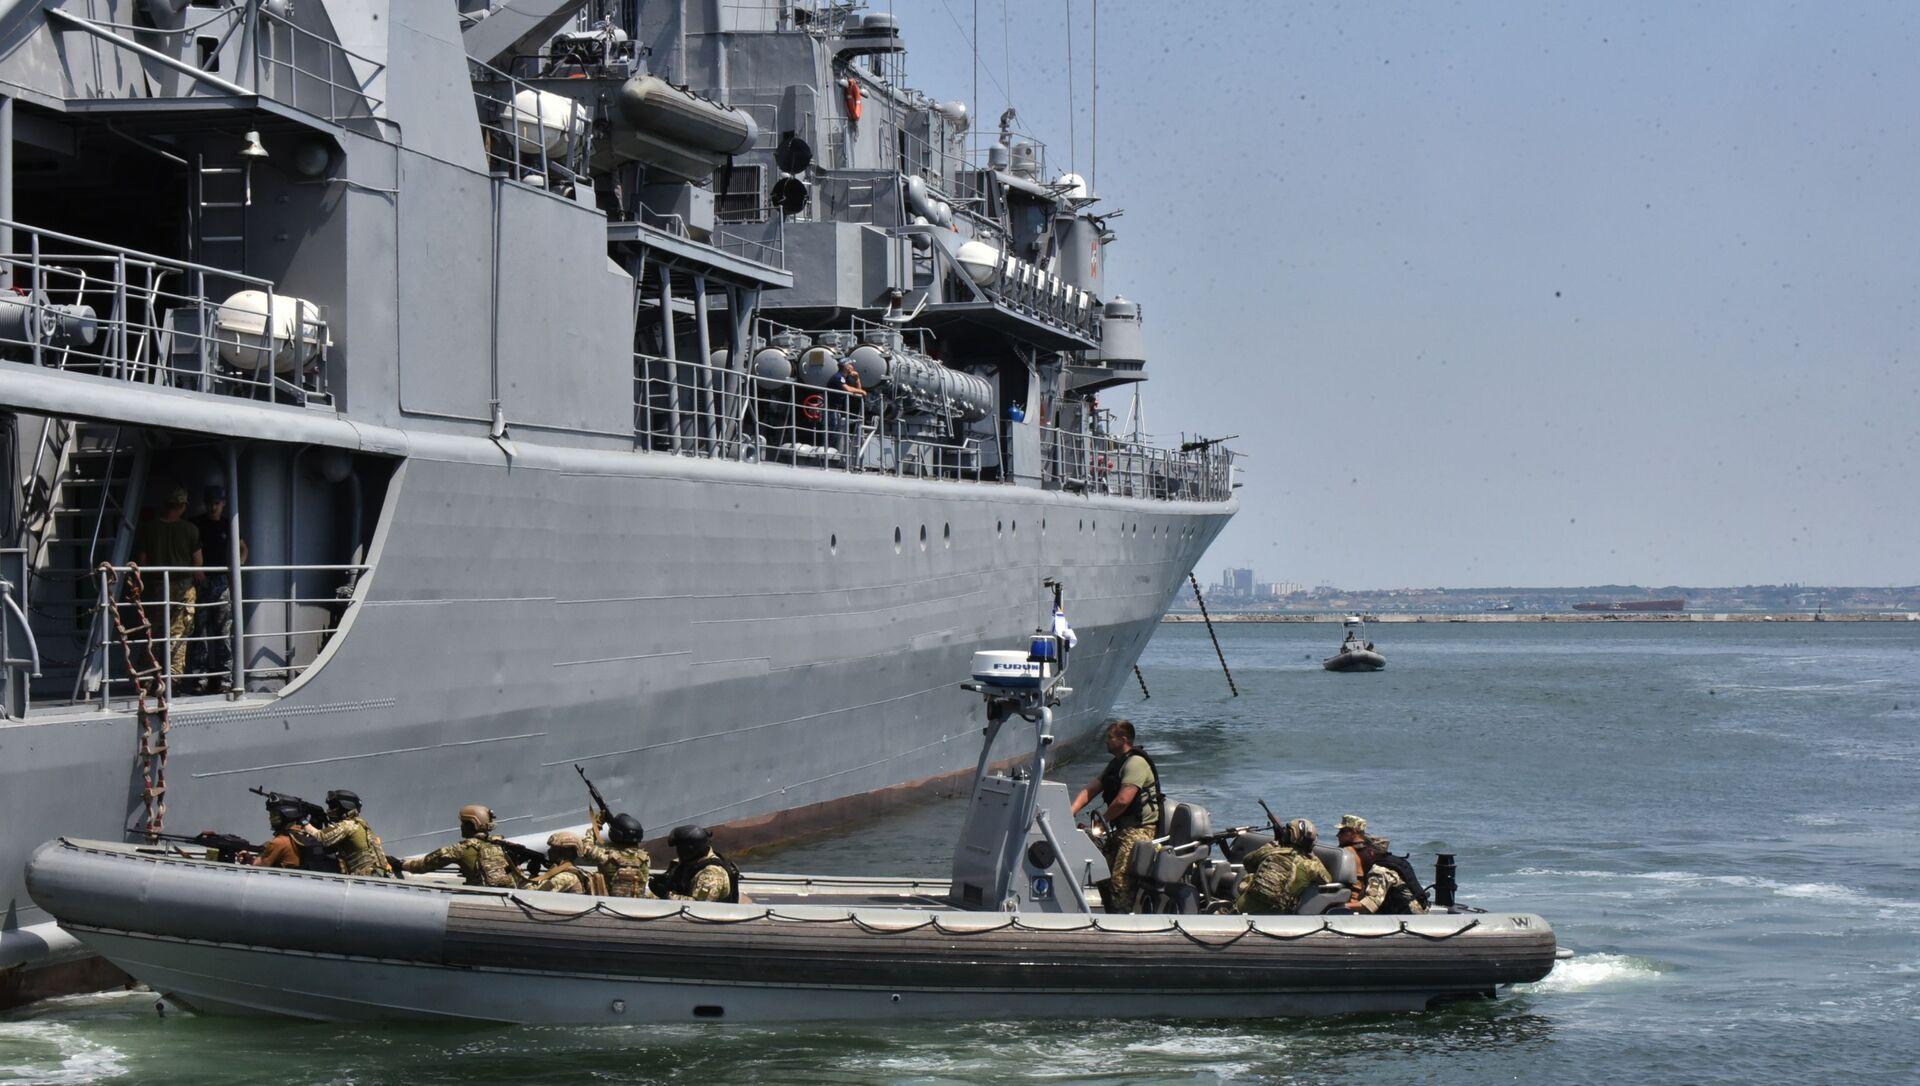 Američko-ukrajinske vojne vežbe Morski povetarac 2019 na Crnom moru - Sputnik Srbija, 1920, 01.02.2021